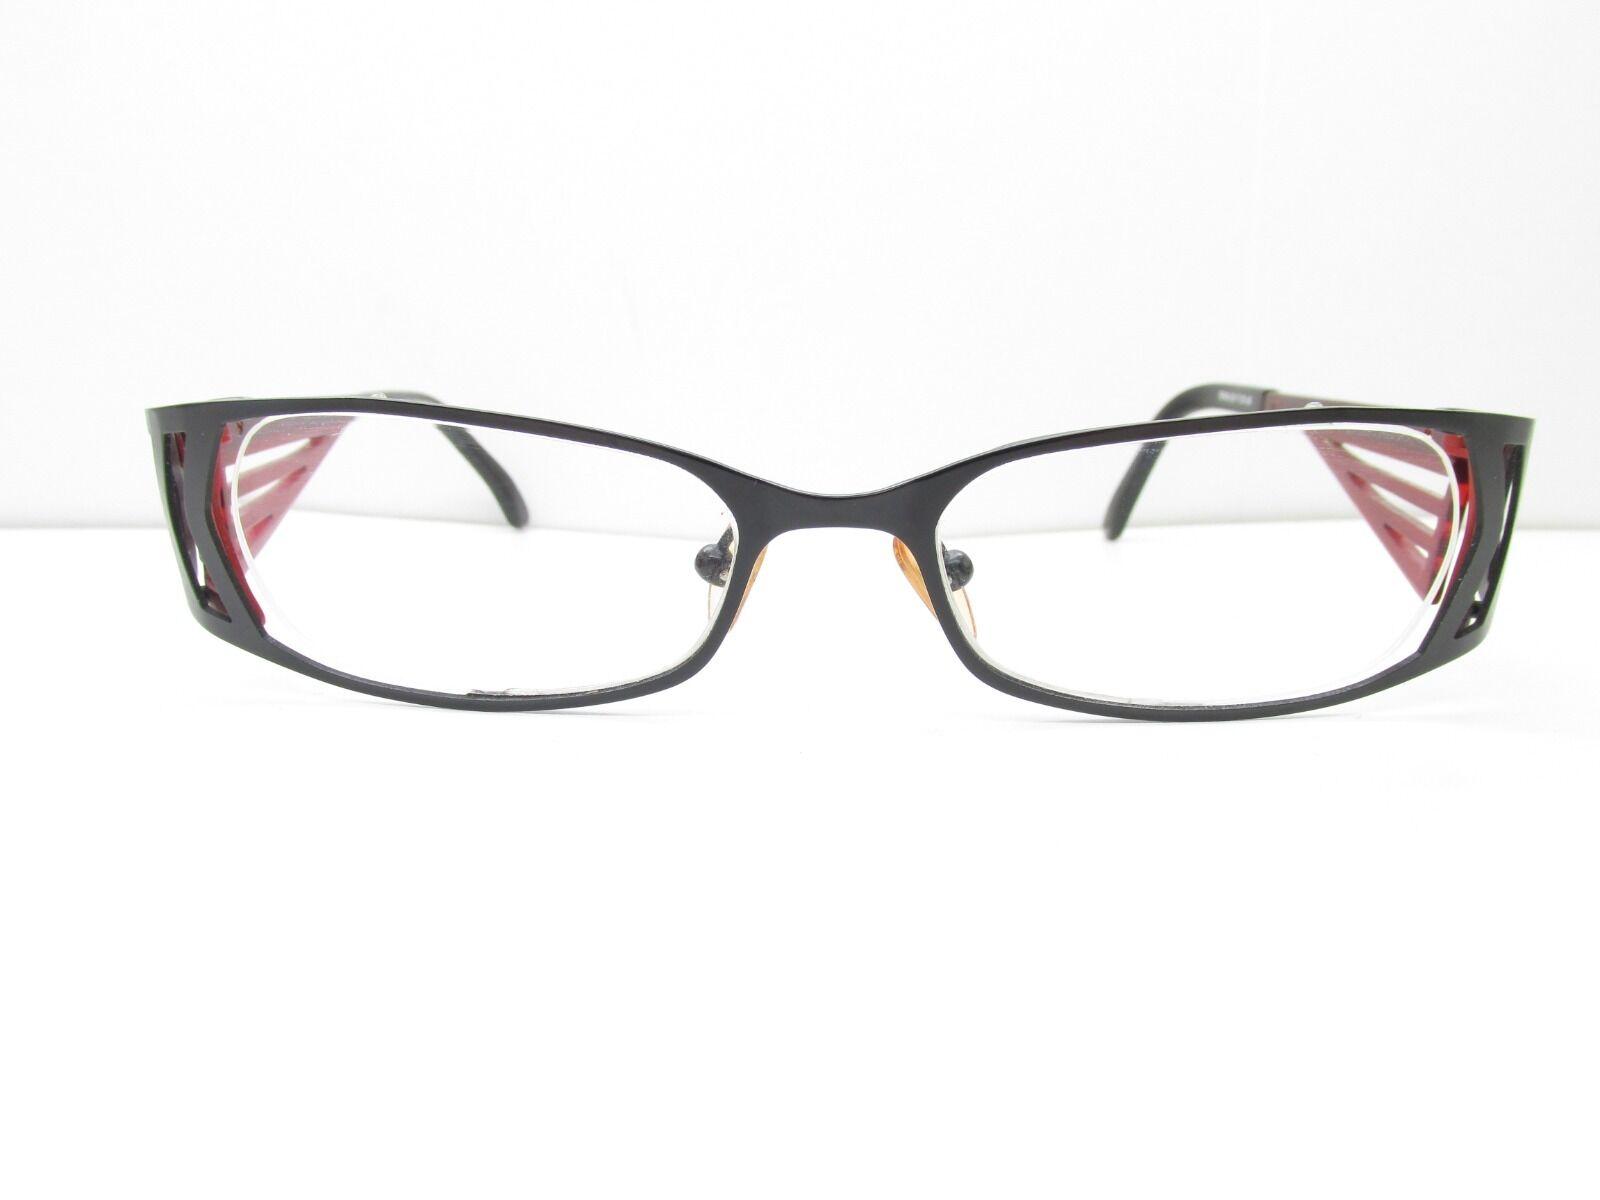 Takumi Patented Technology T9740 Eyewear Frames 50-17-135 Unique Tv6 ...